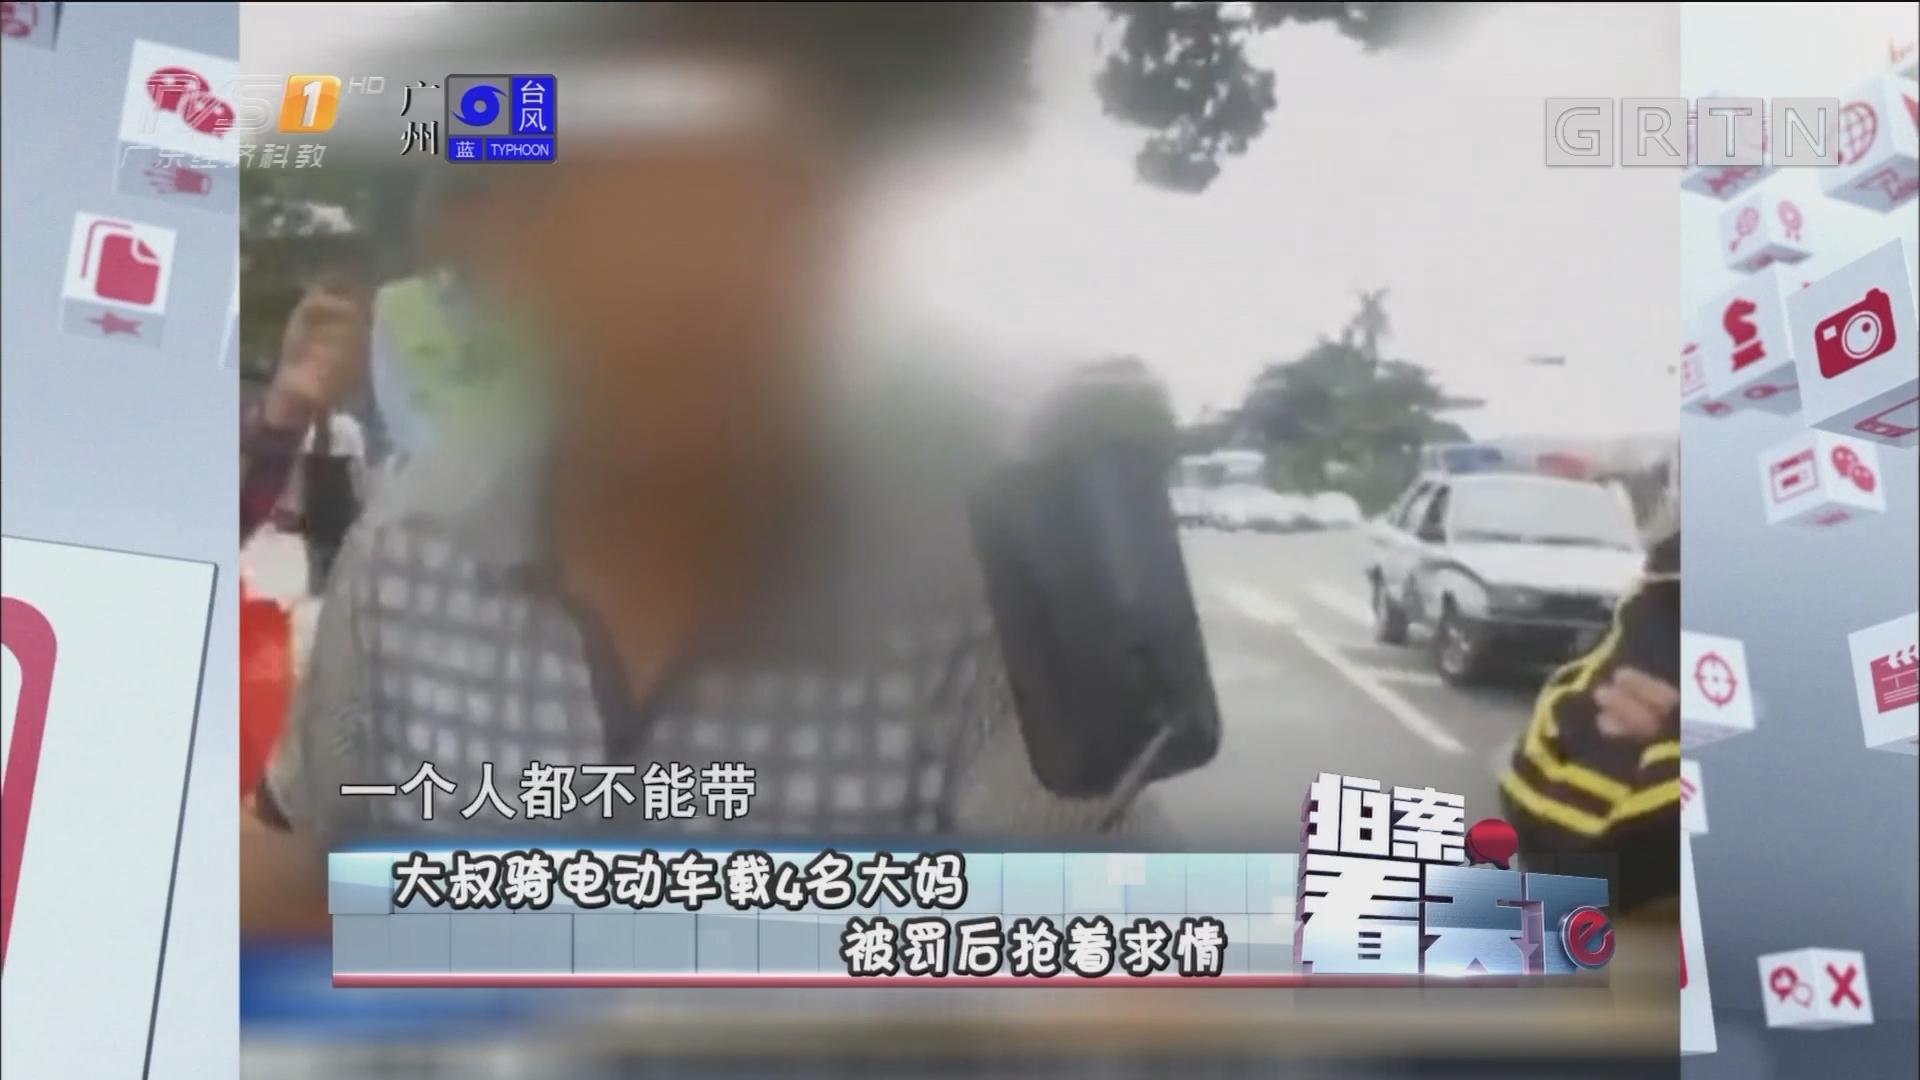 [HD][2017-06-12]拍案看天下:大叔骑电动车载4名大妈 被罚后抢着求情